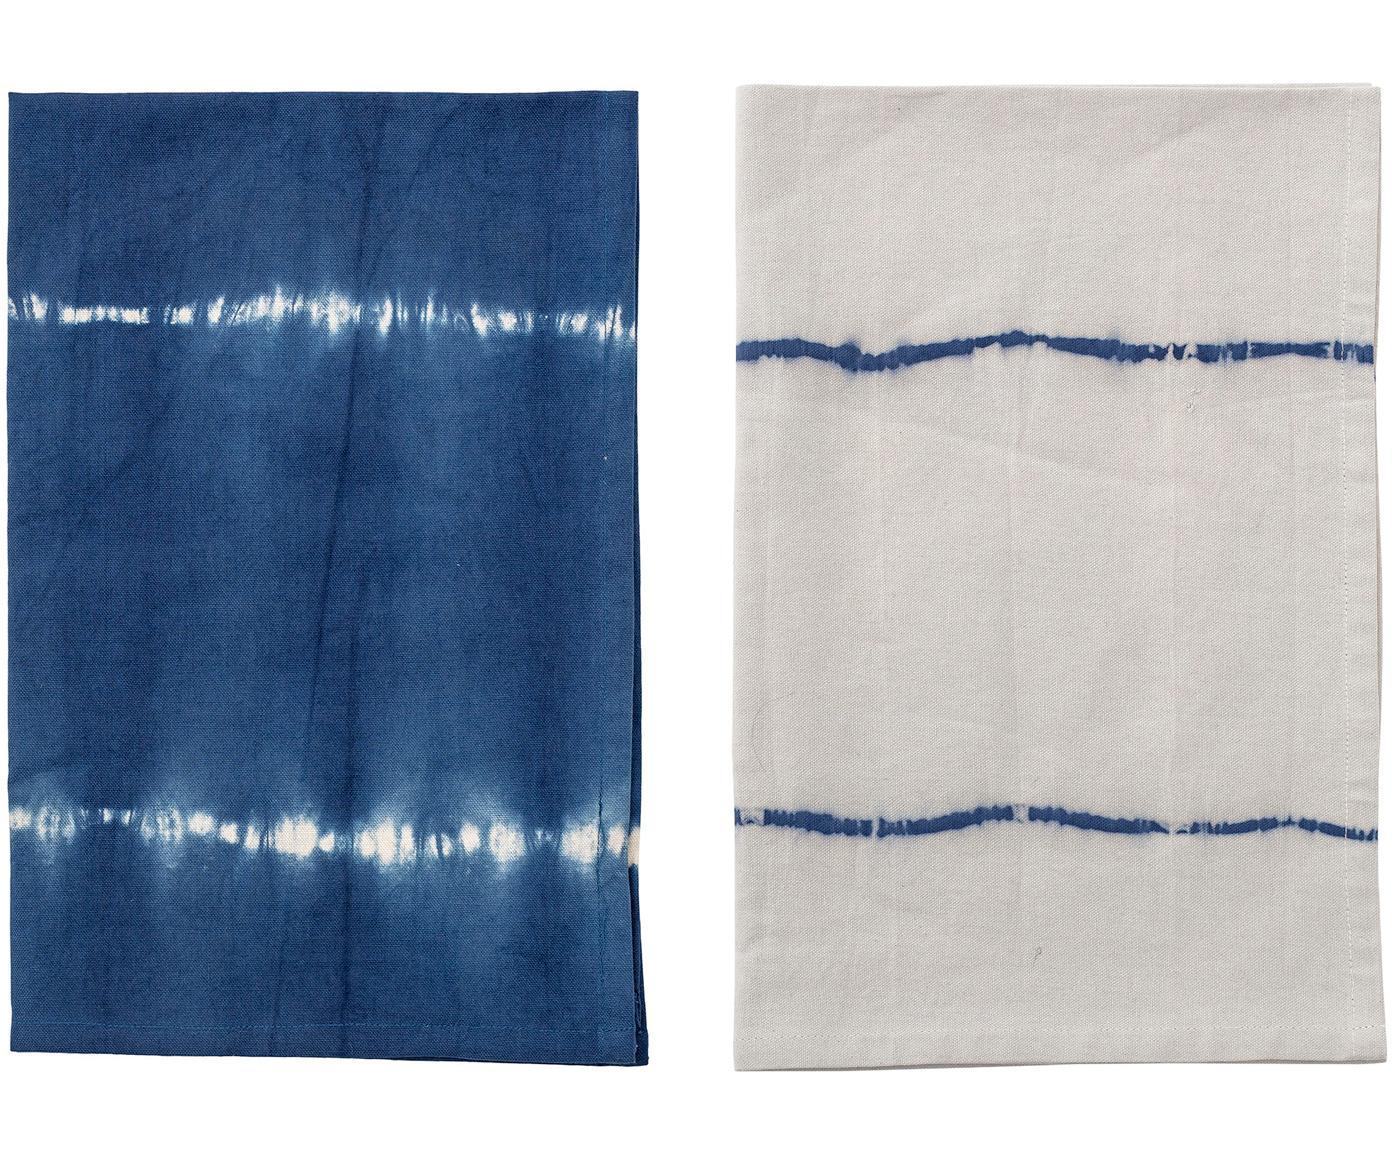 Set de paños de cocina Alston, estilo batik, 2pzas., 100%algodón, Azul, An 45 x L 70 cm